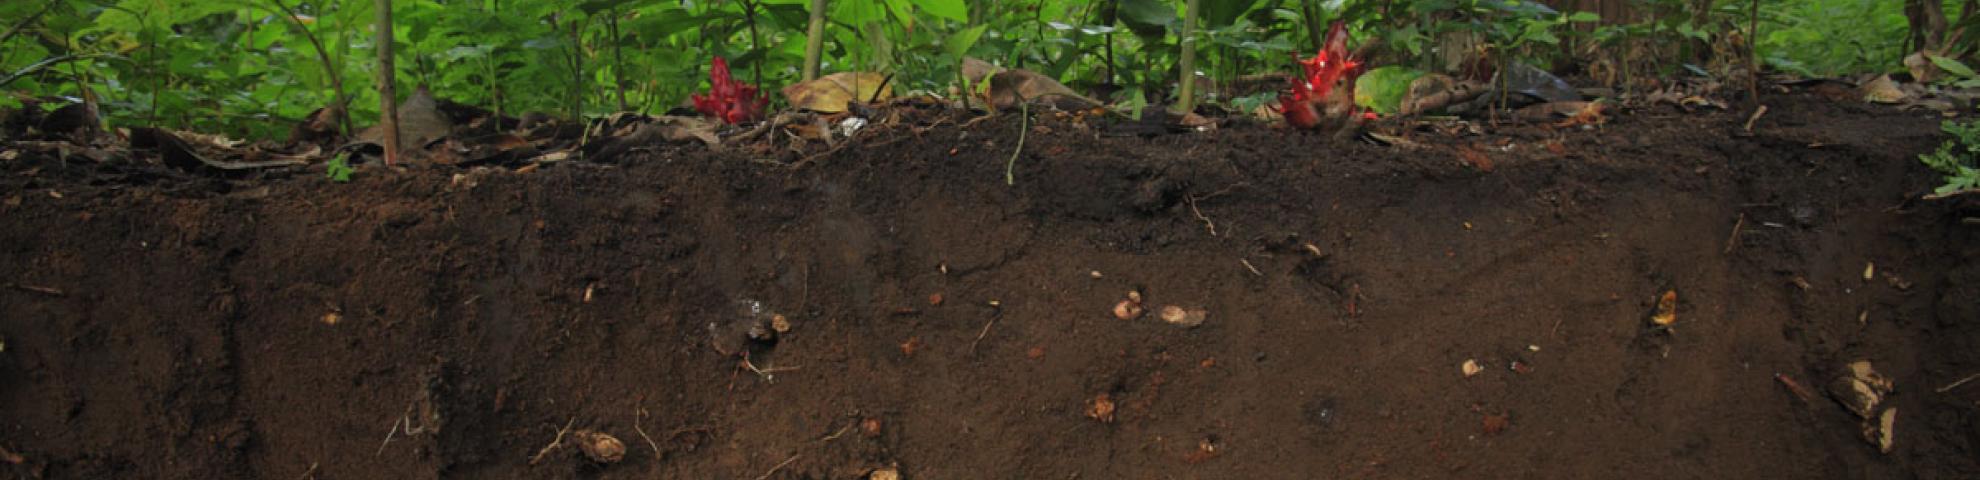 soil profile in a rainforest